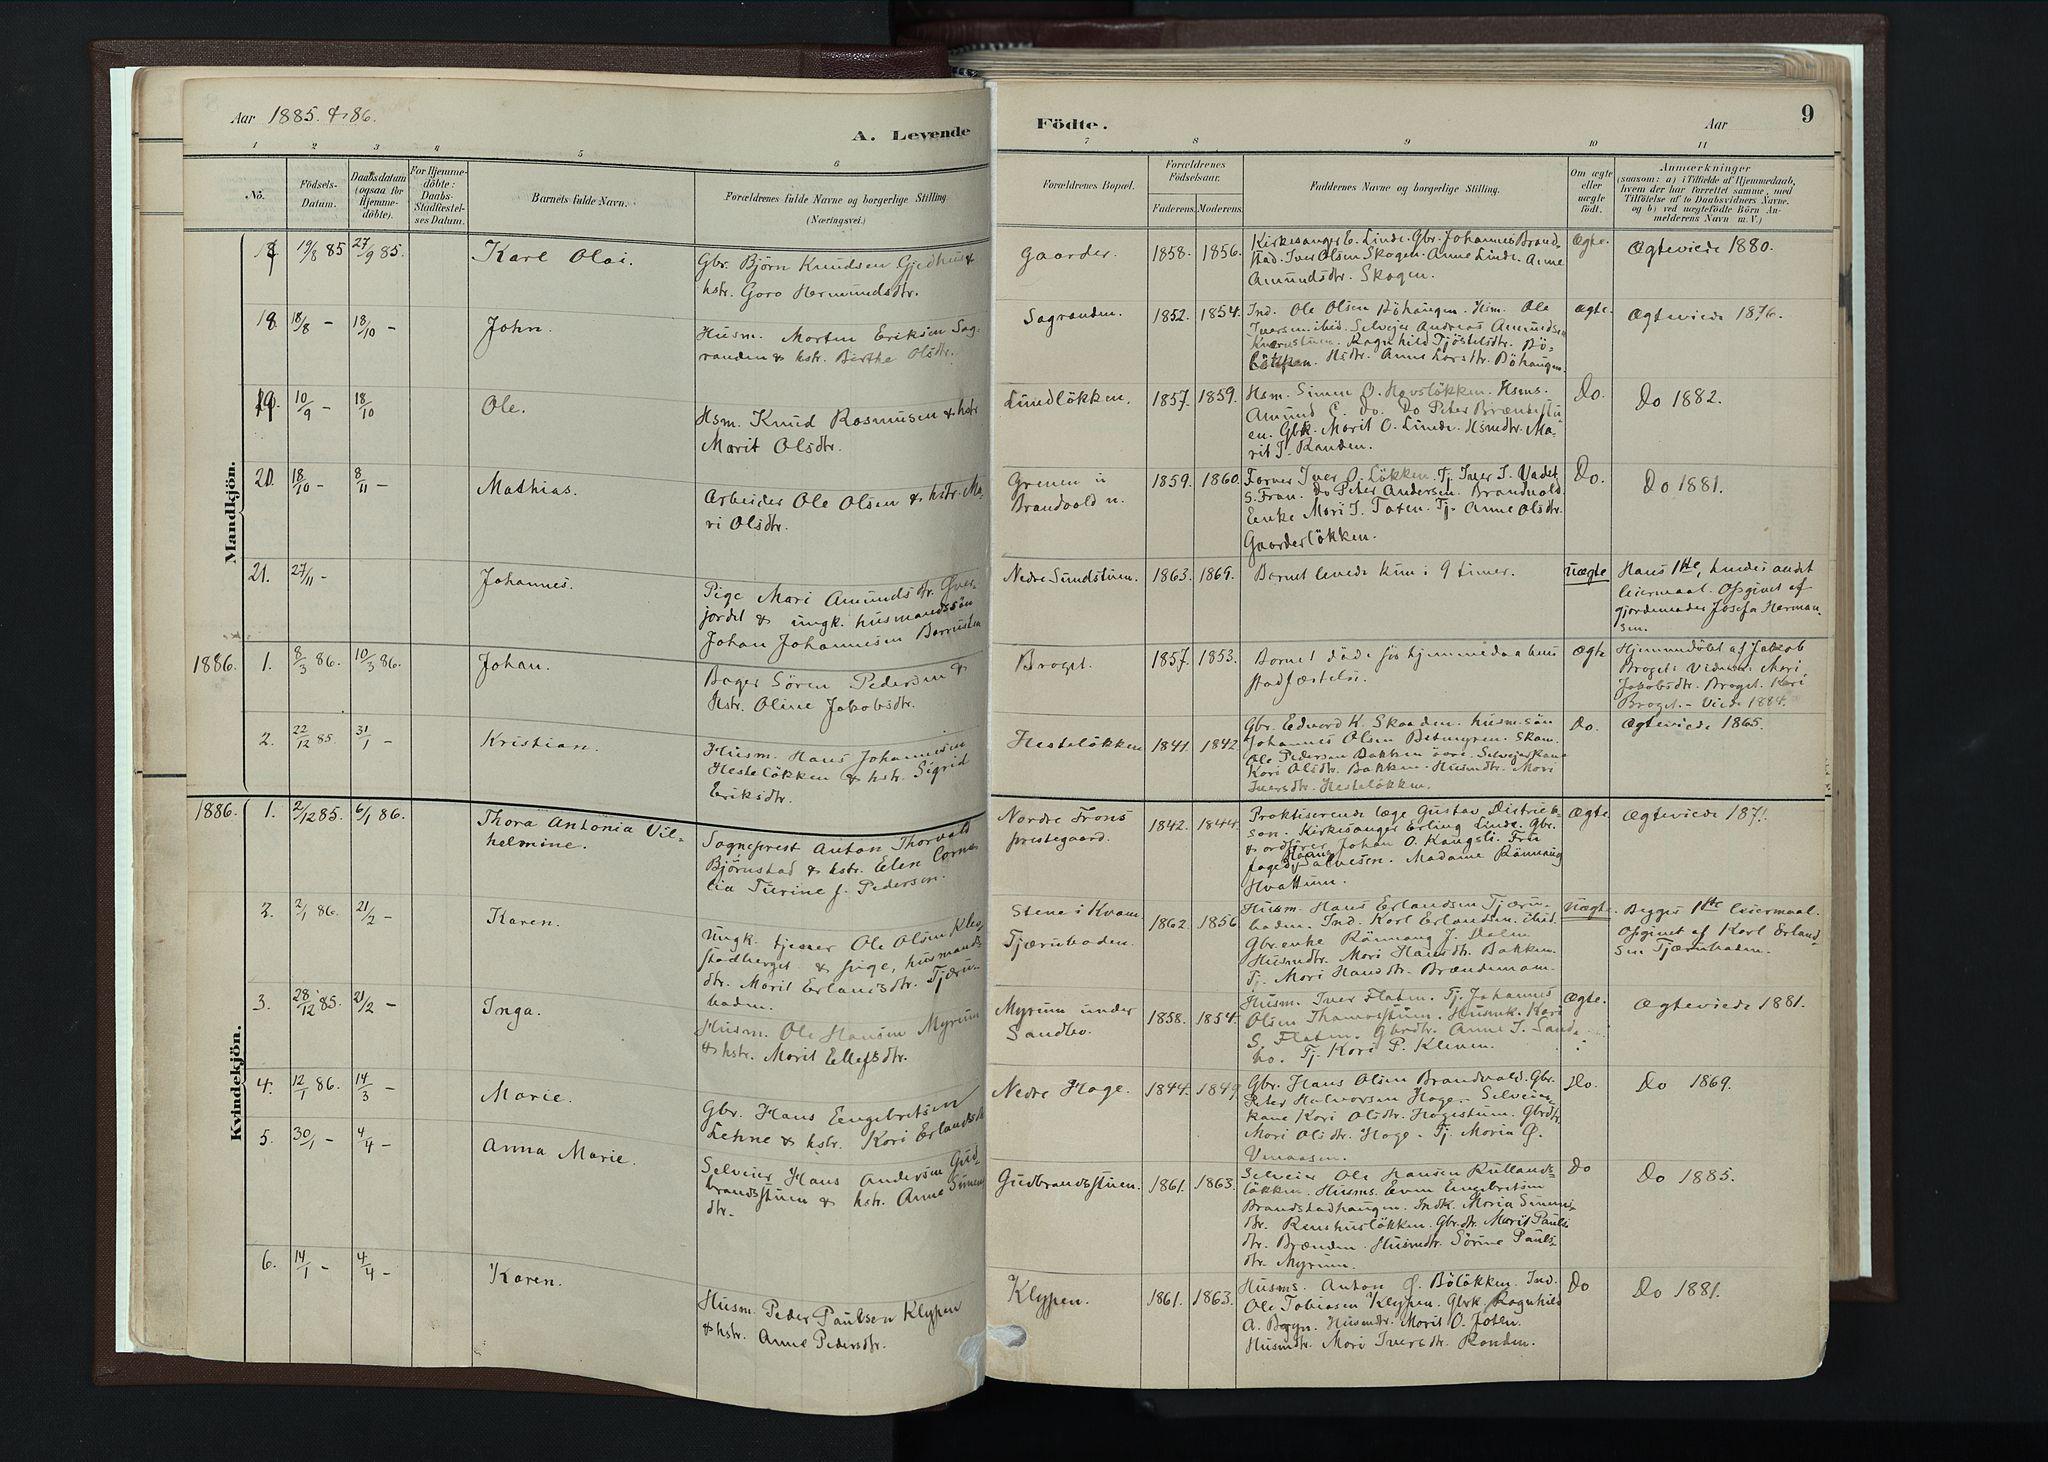 SAH, Nord-Fron prestekontor, Ministerialbok nr. 4, 1884-1914, s. 9